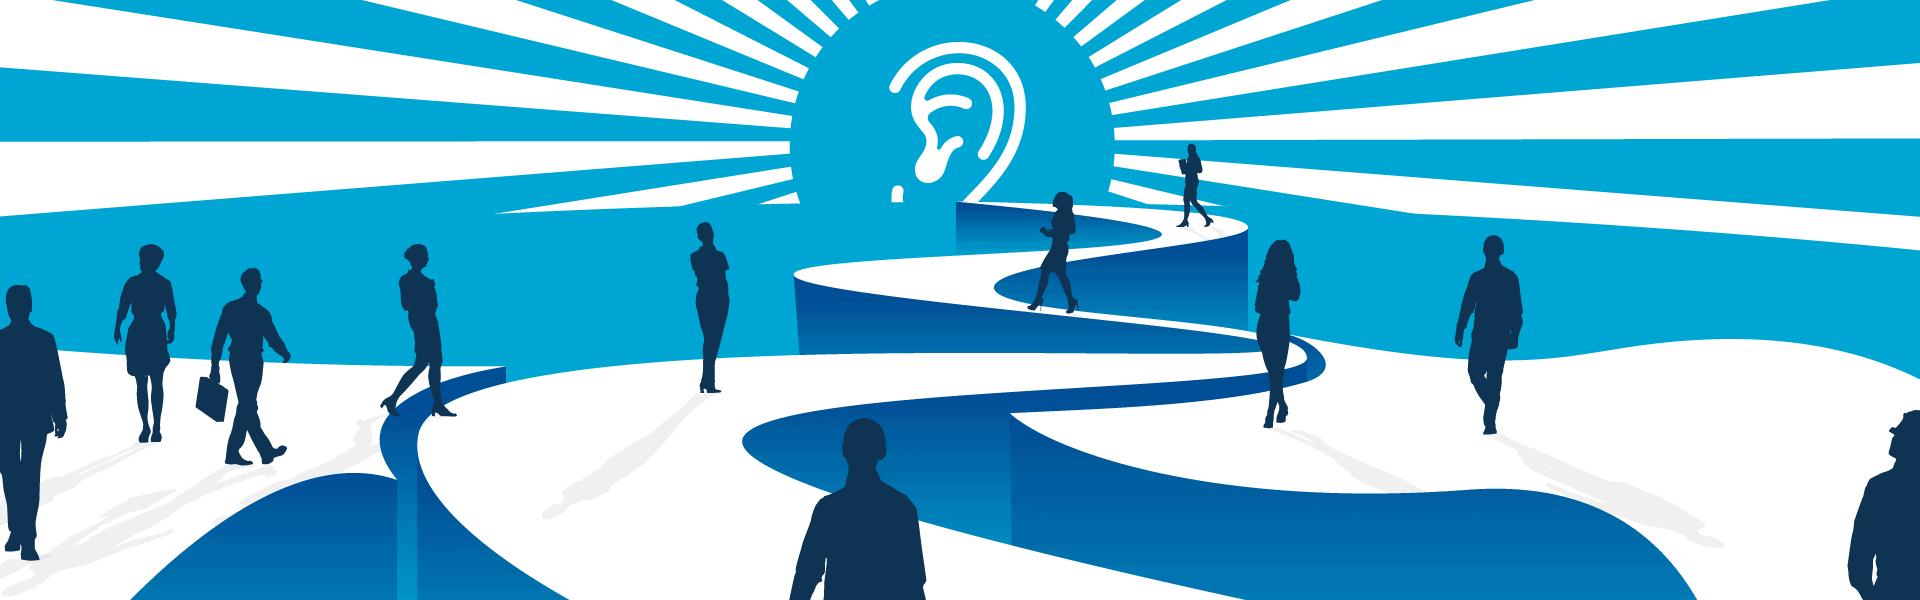 Pathways to Audiology Series Header